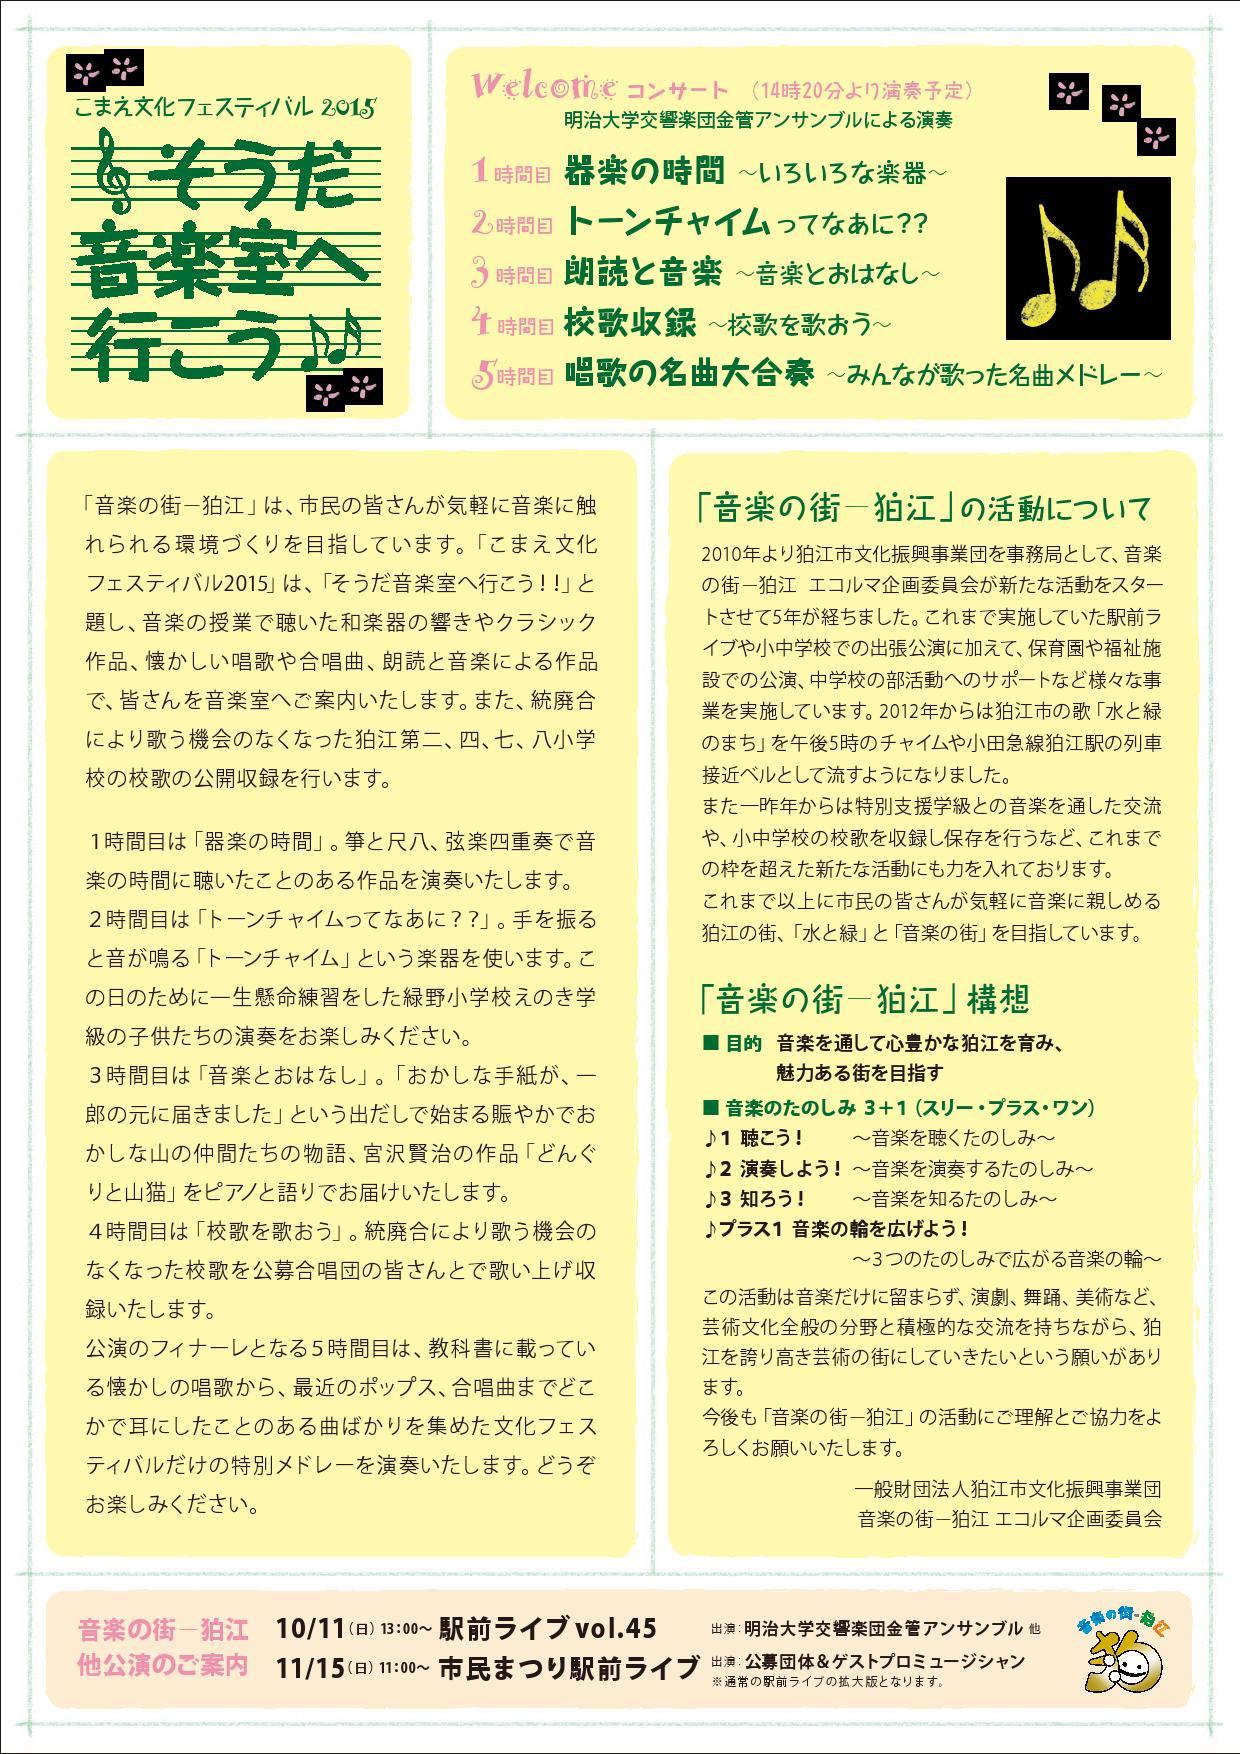 http://onkoma.jp/event/%E3%81%93%E3%81%BE%E3%81%88%E6%96%87%E5%8C%96%E3%83%95%E3%82%A7%E3%82%B92015_1509030002.jpg